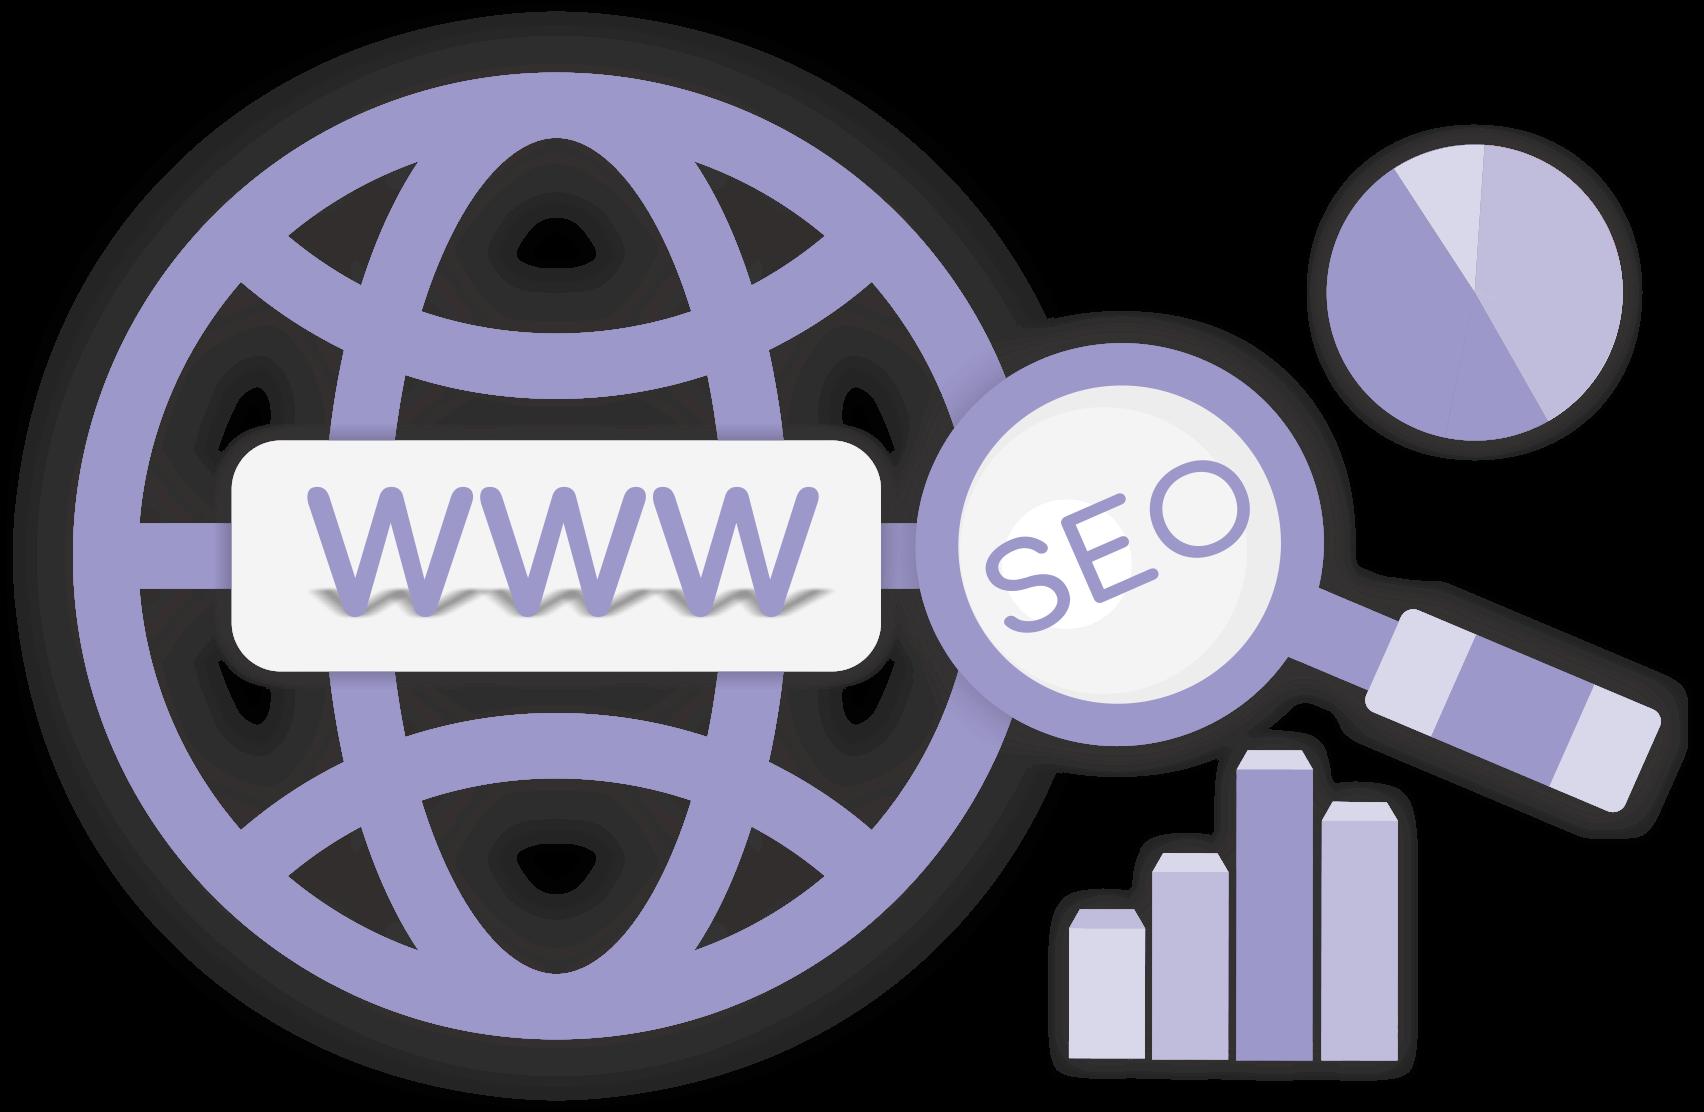 dezvoltare website, web design dermatologie, web medicina